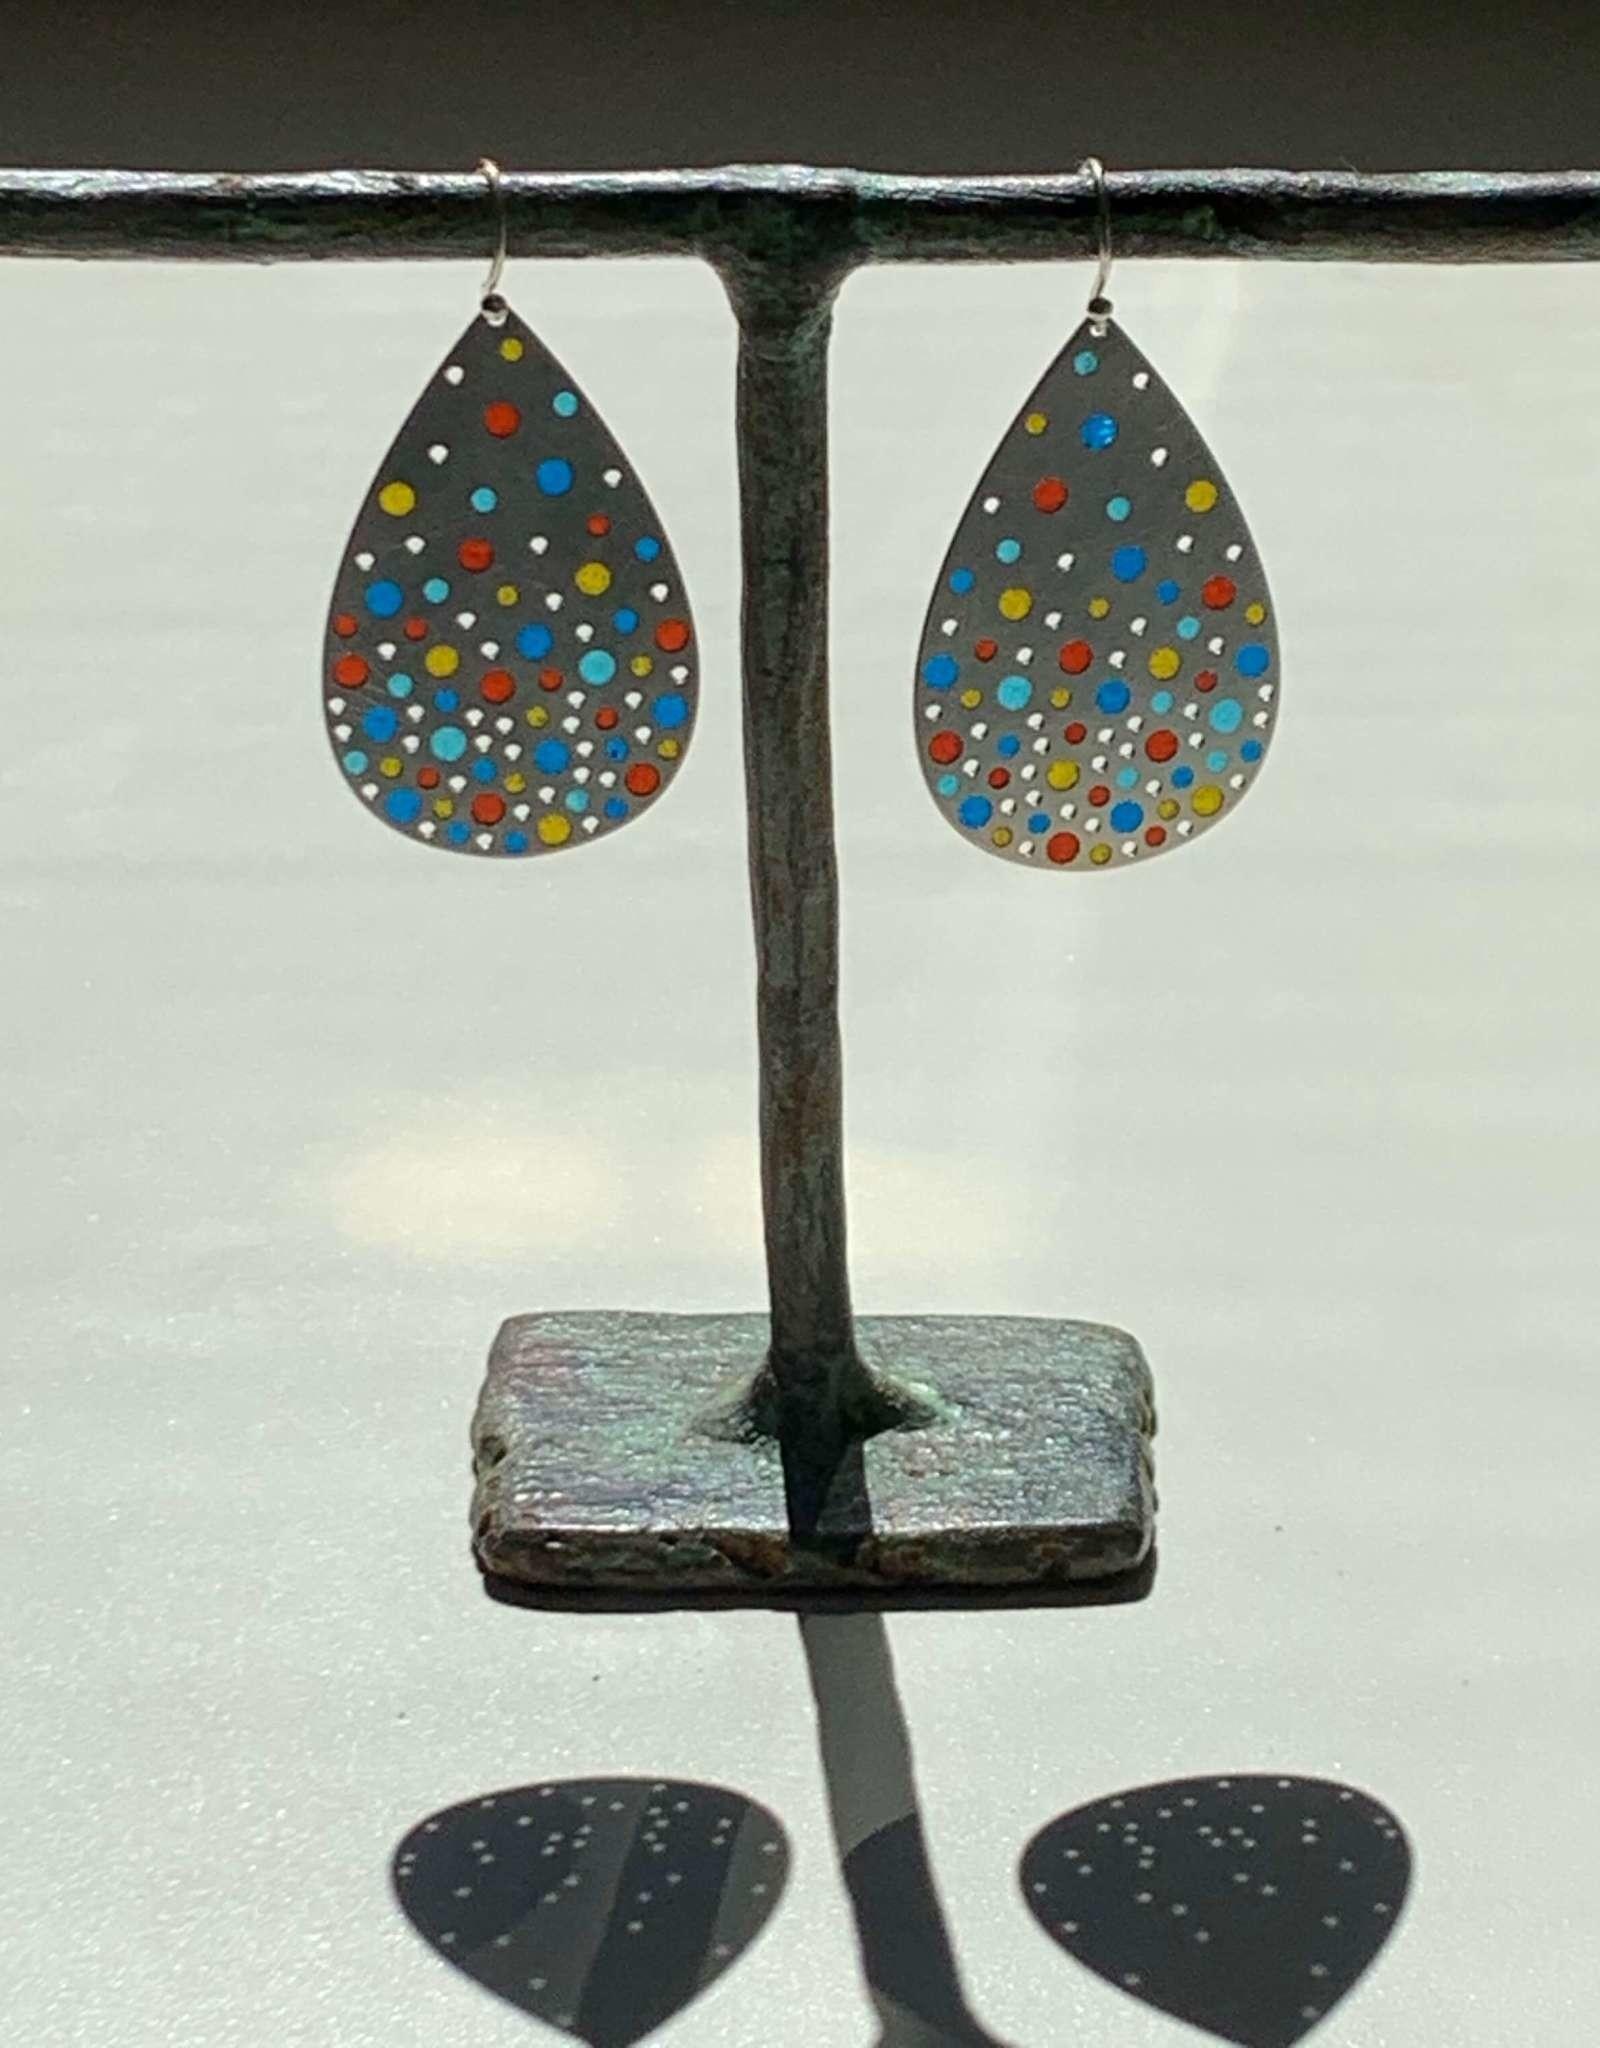 Hilary Finck Jewelry Hilary Finck Teardrops: Red, Blue & Yellow